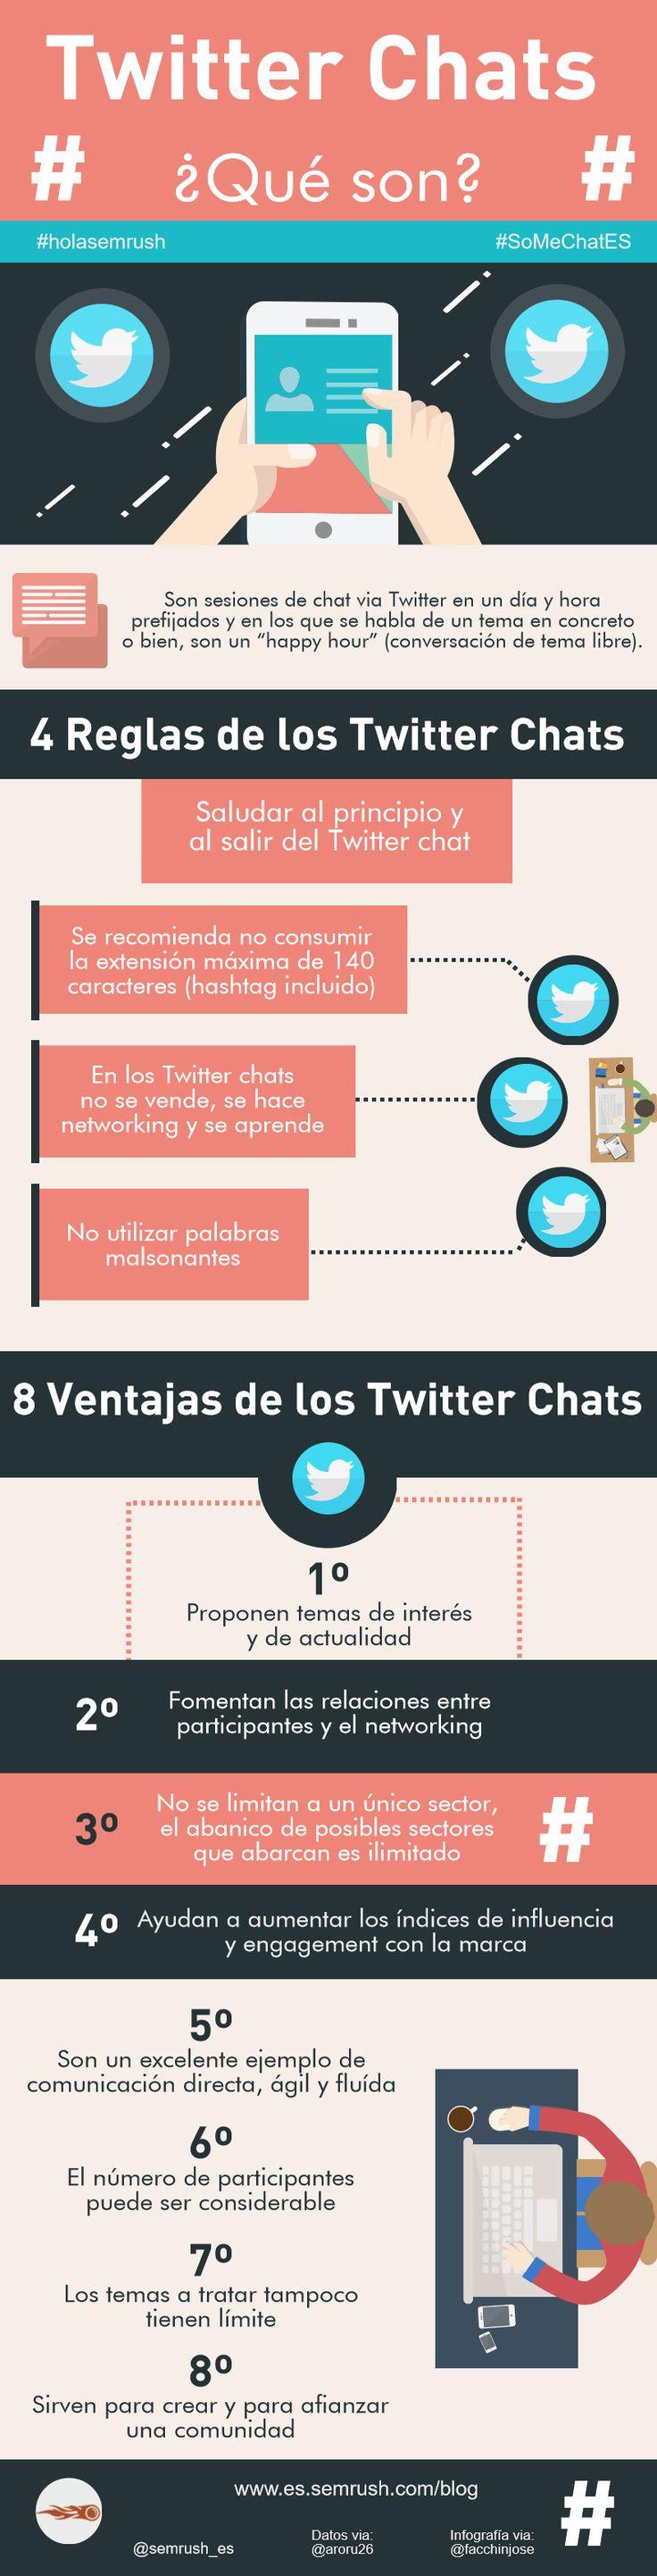 Twitter chats: Todo lo que debes de saber. #infografia #twitter #socialmedia